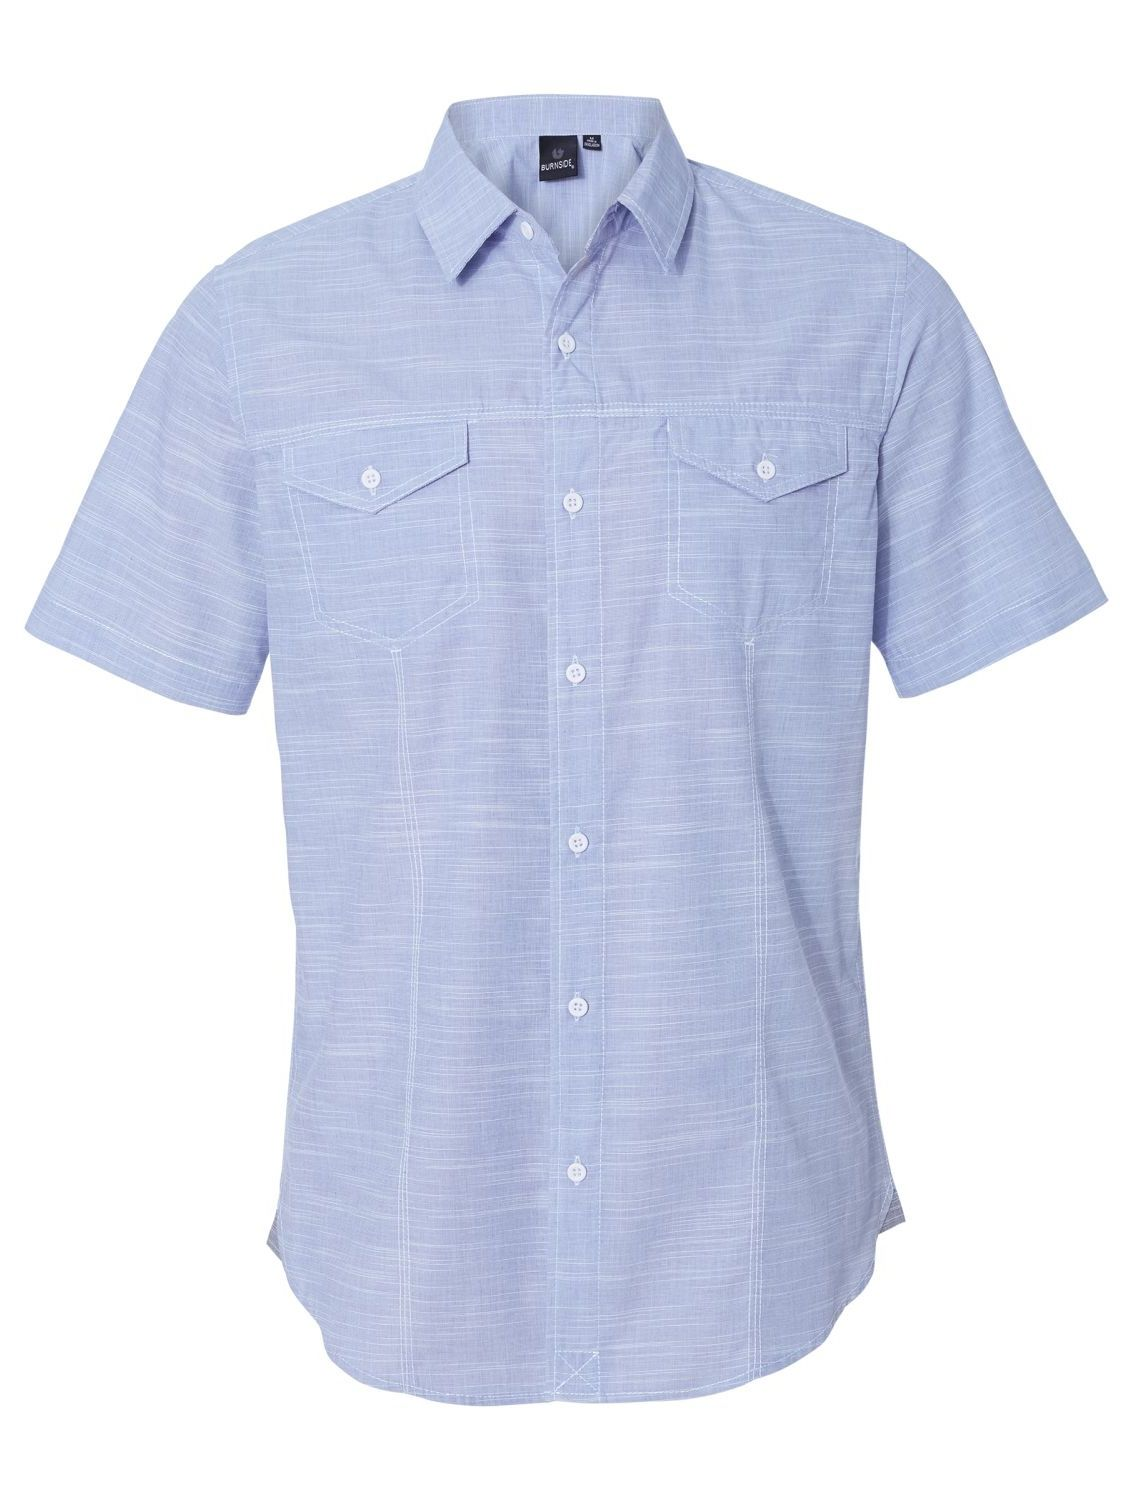 Burnside Burnside New Iwpf Men Textured Solid Short Sleeve Shirt Walmart Com In 2021 Casual Shirts For Men Short Sleeve Shirt Casual Shirts [ 1499 x 1125 Pixel ]